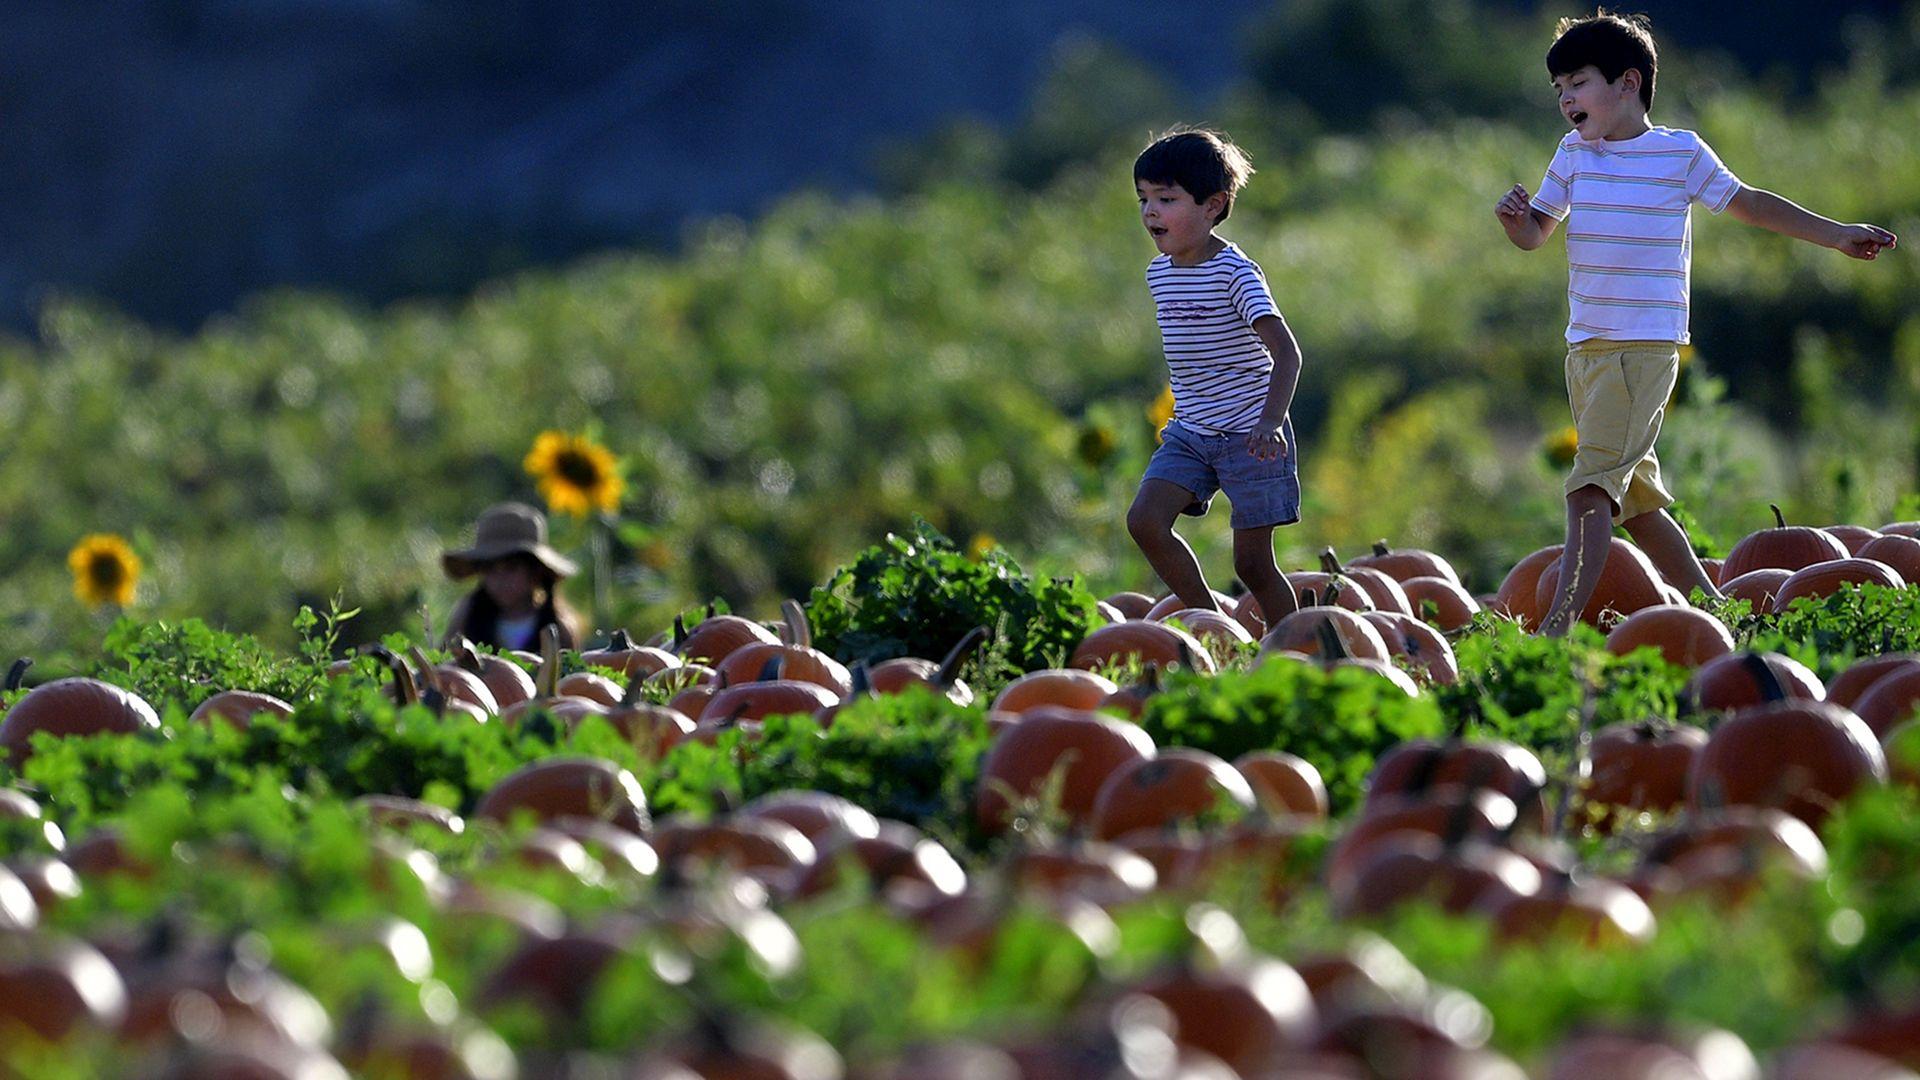 Two boys run through a pumpkin patch